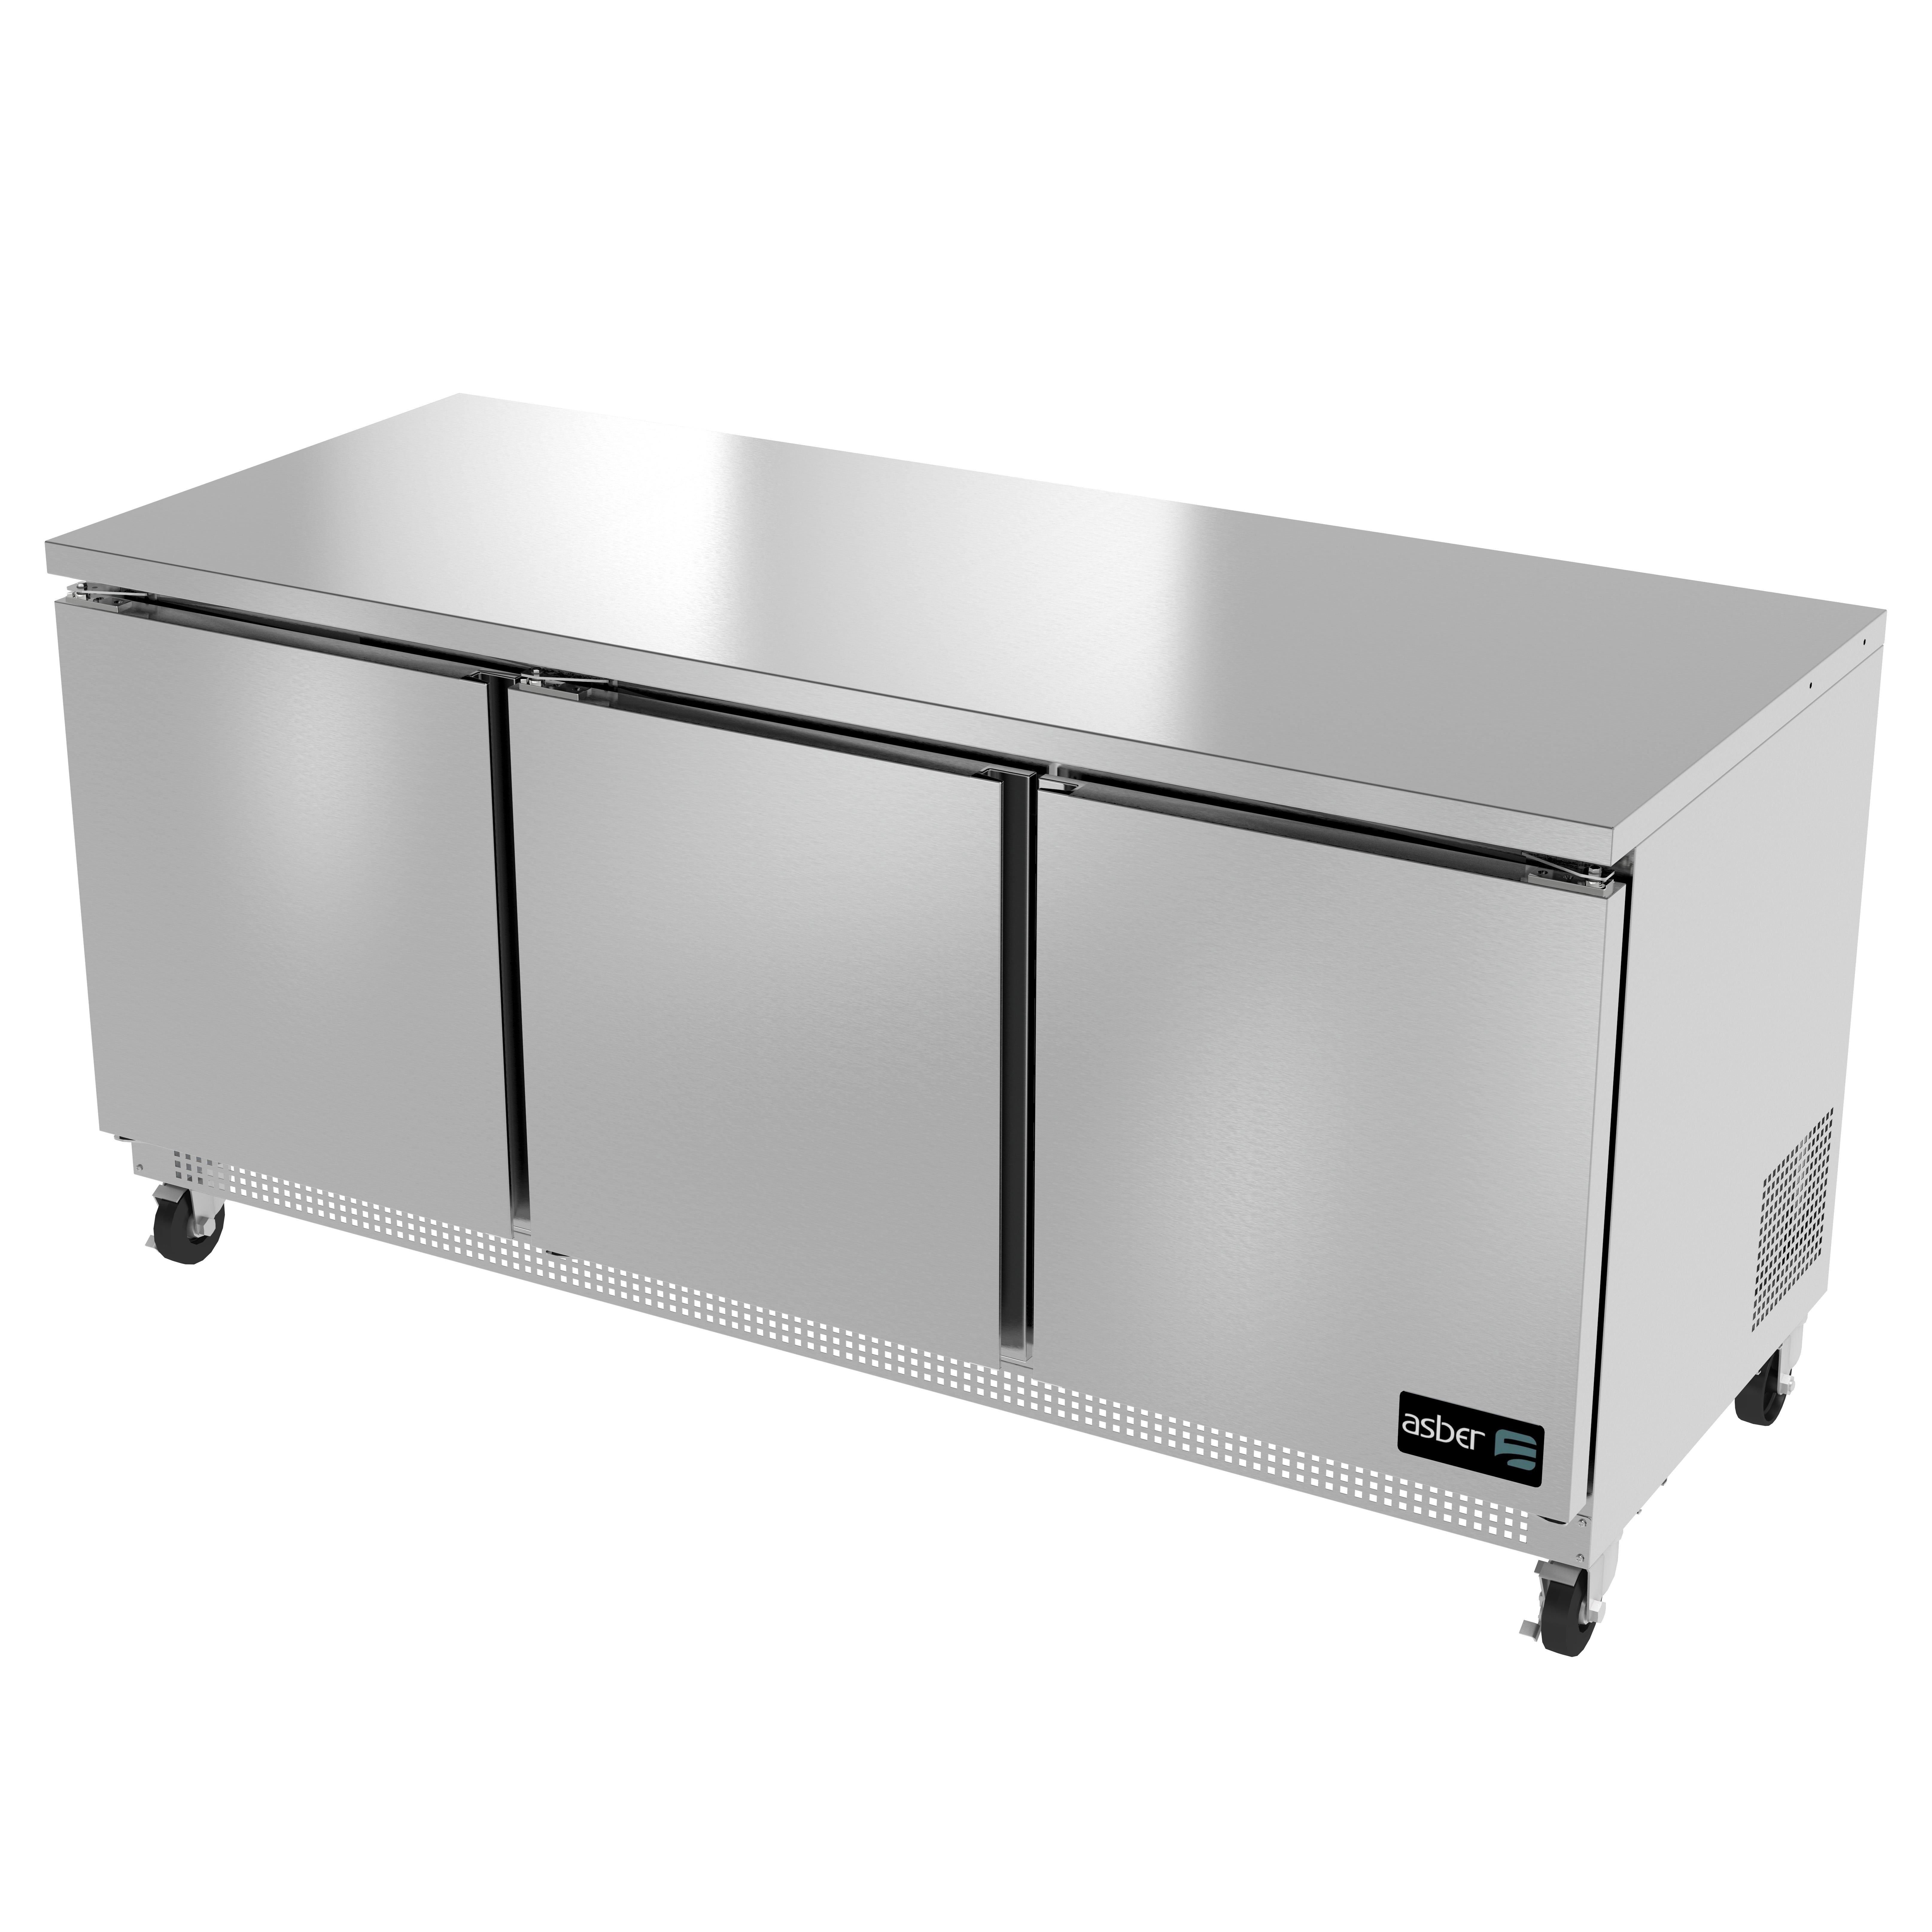 Asber AUTR-72 refrigerator, undercounter, reach-in